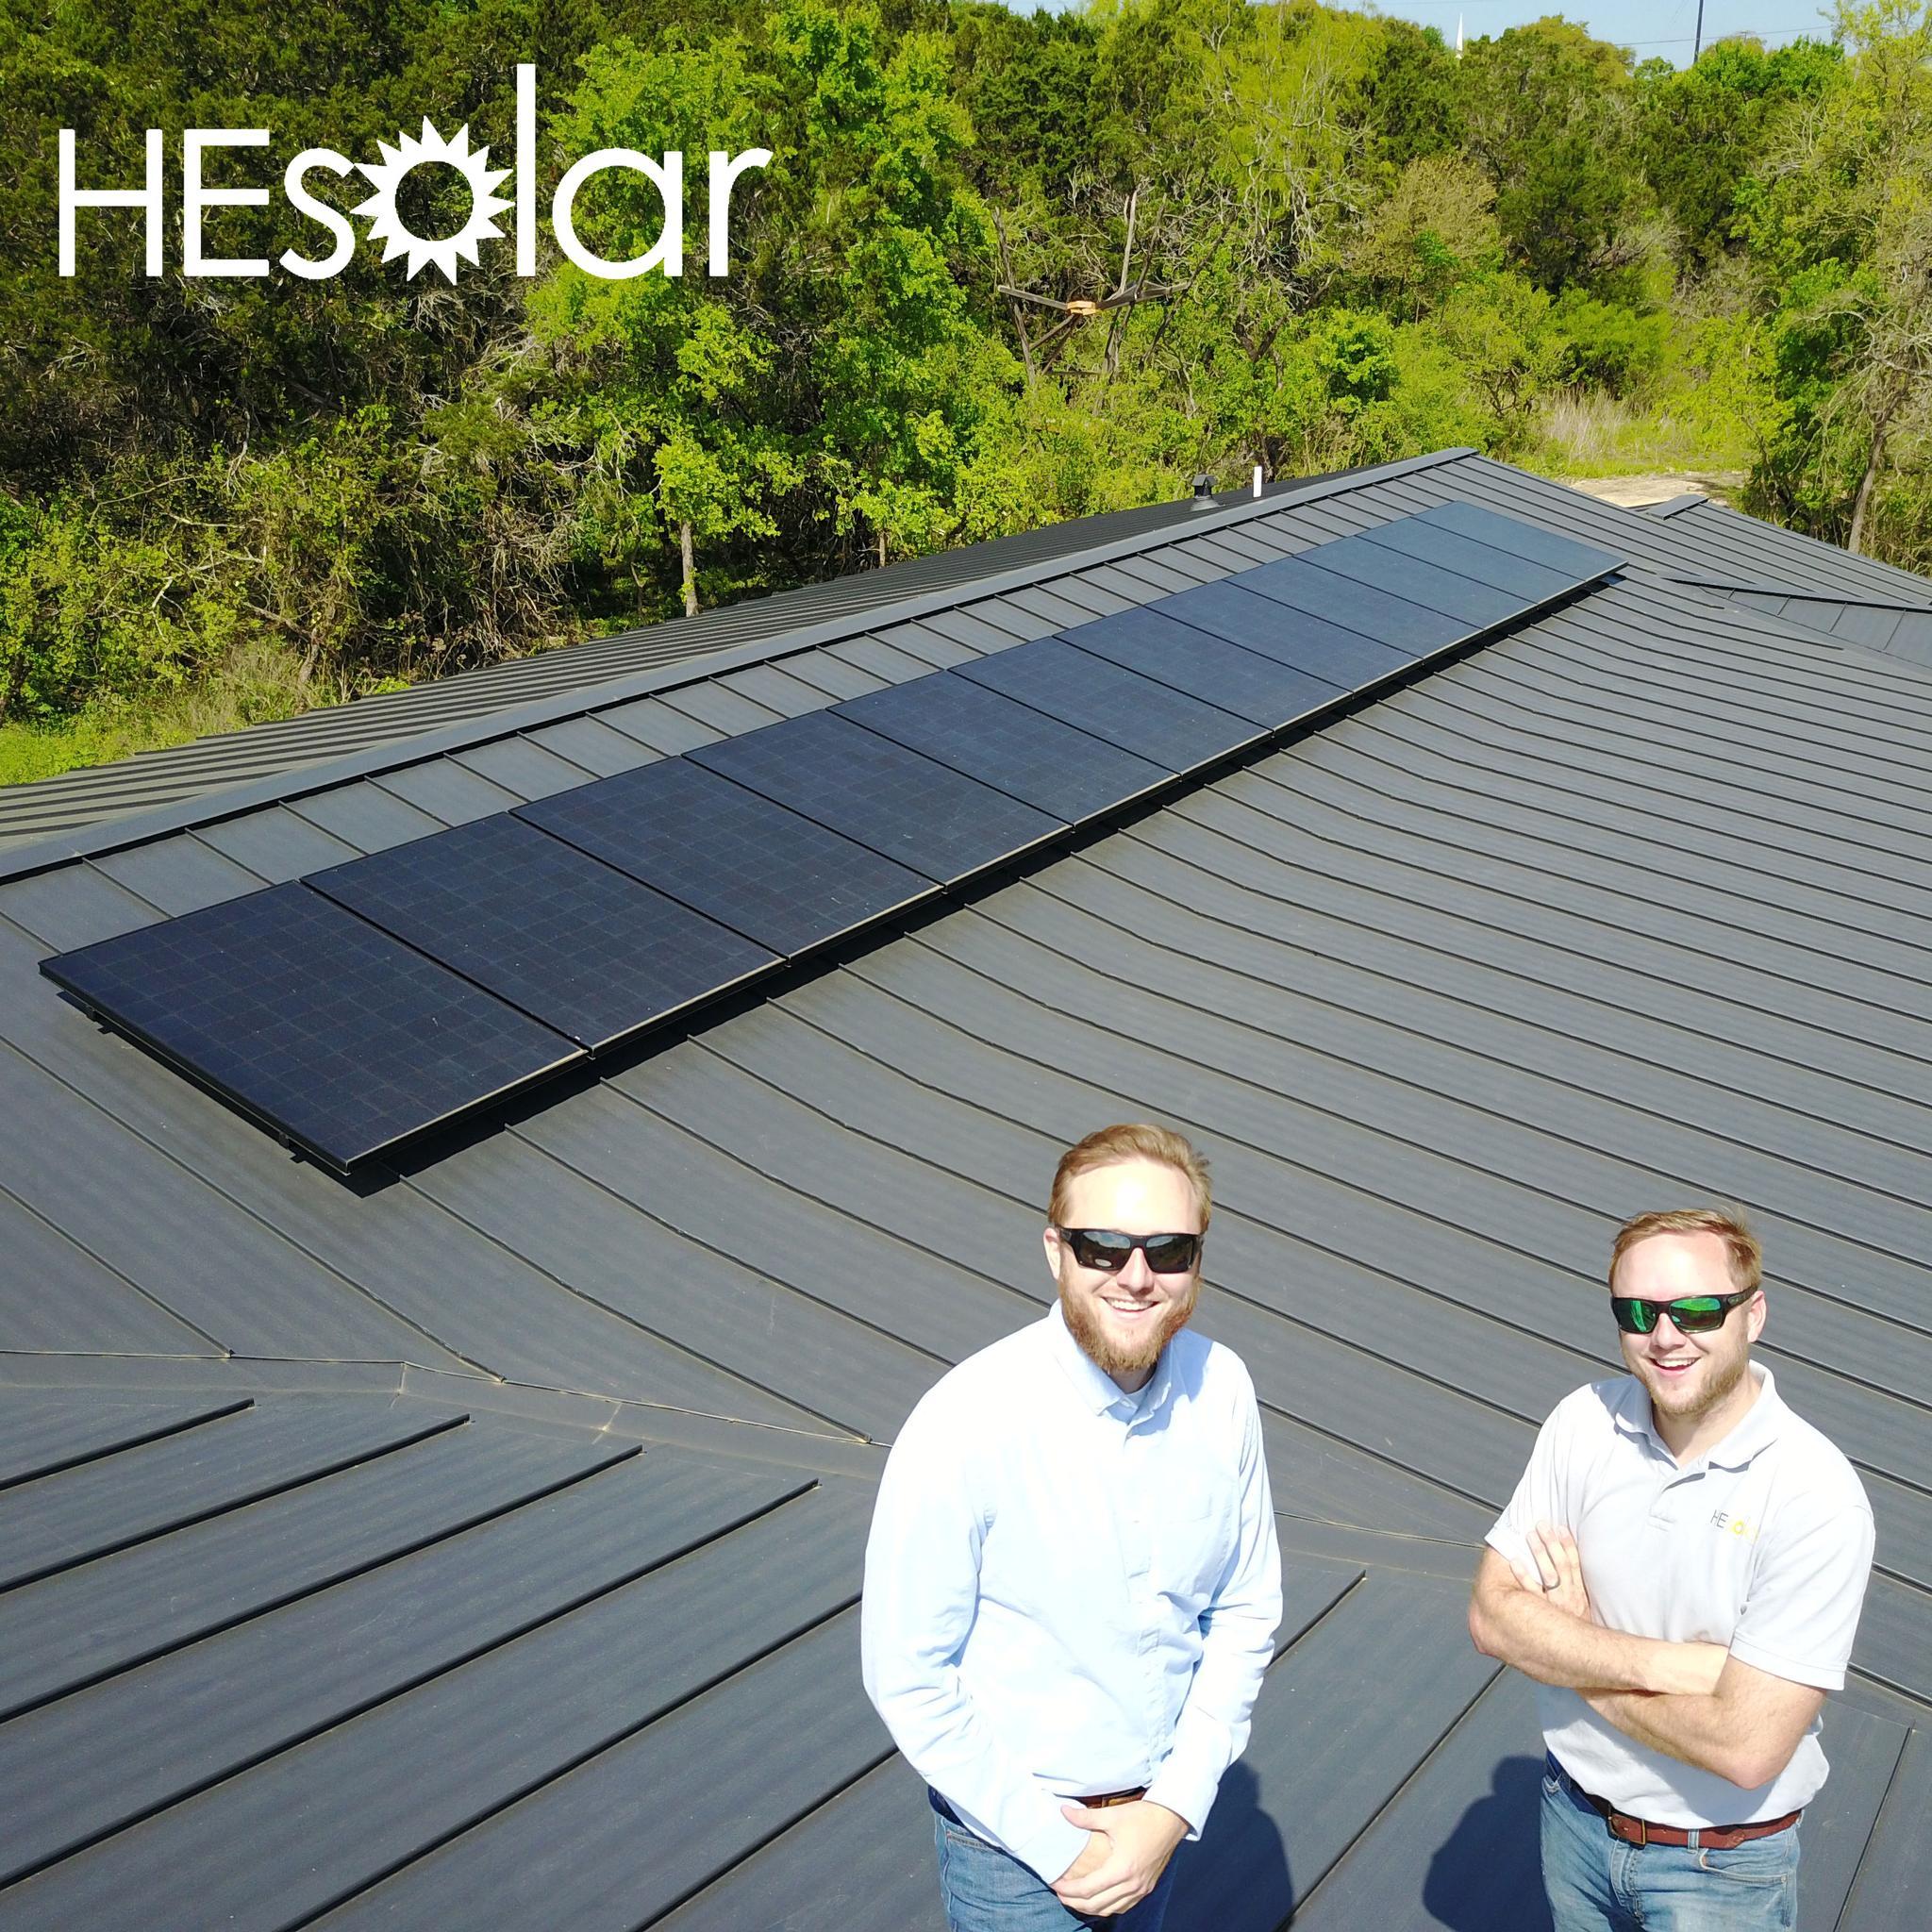 Hesolar Profile Amp Reviews 2019 Energysage